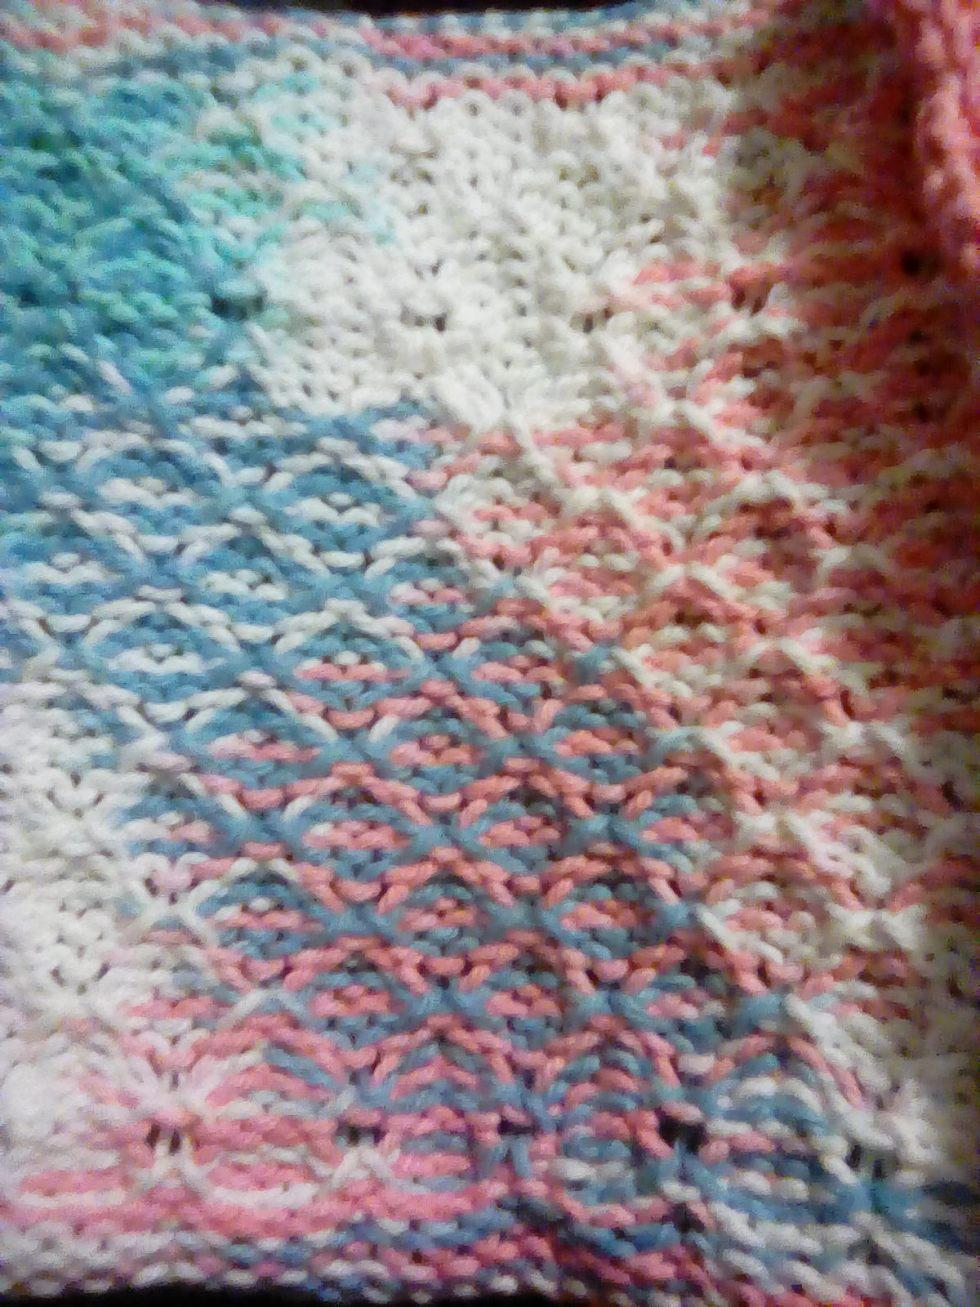 Tuck-stitched wash cloth